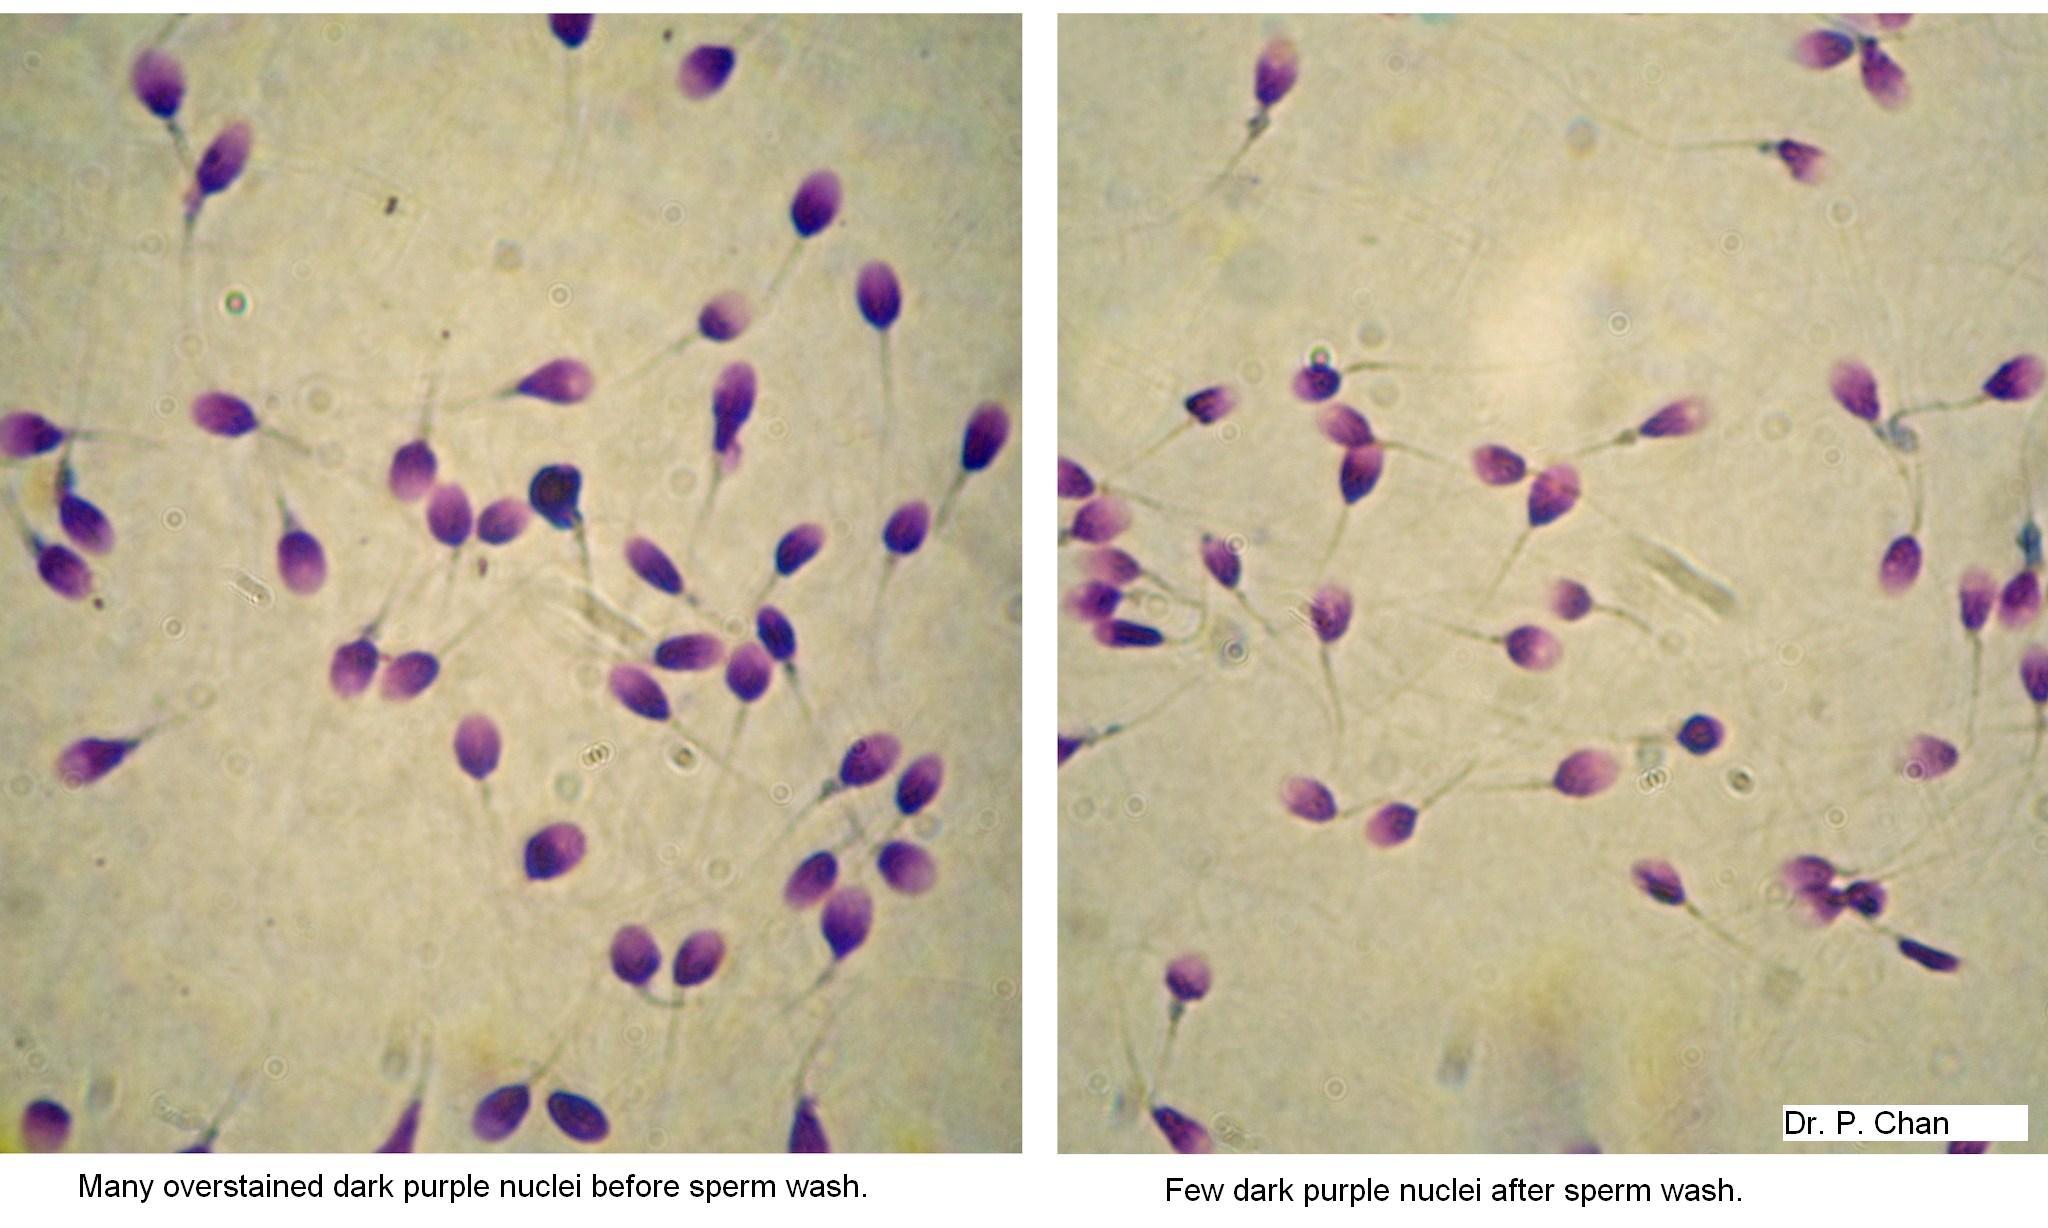 Fertility research image: sperm integrity